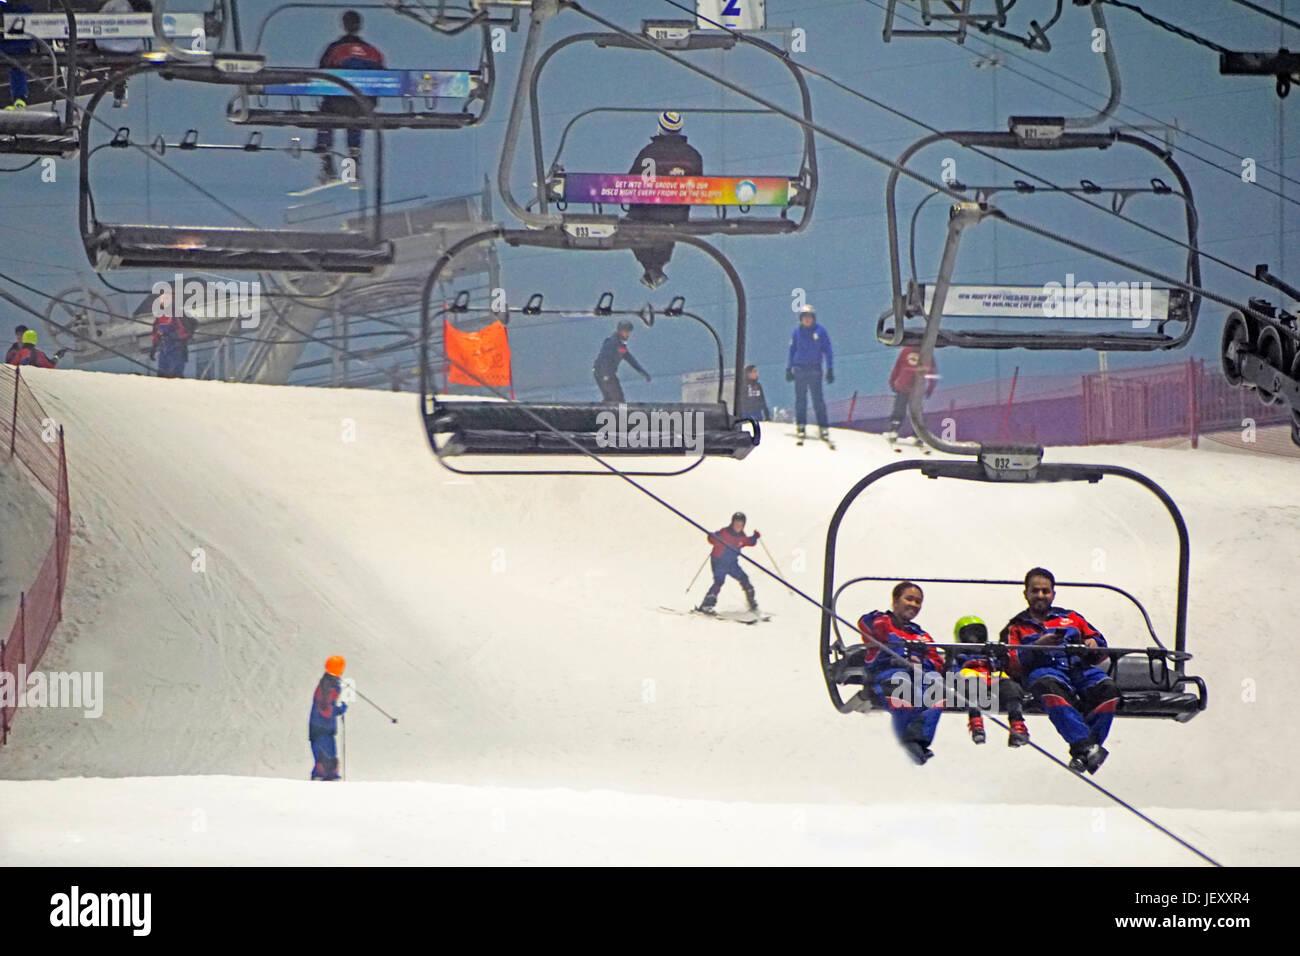 Ski Dubai at Mall of the Emirates - Stock Image